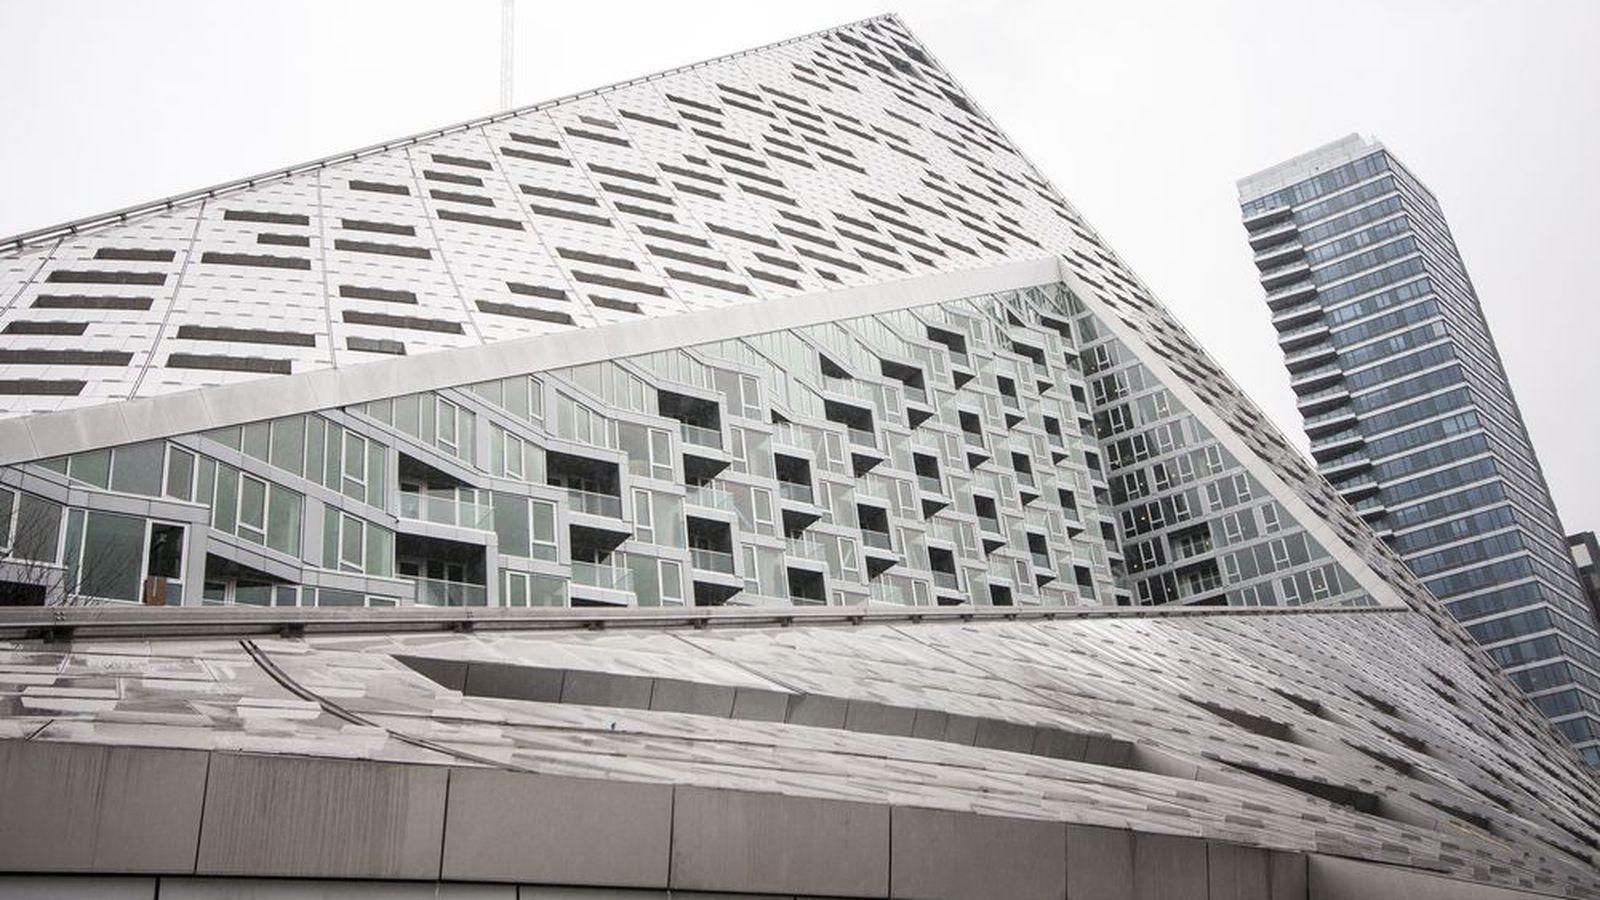 Bjarke Ingelss Tetrahedron Gets A Massive Sculpture